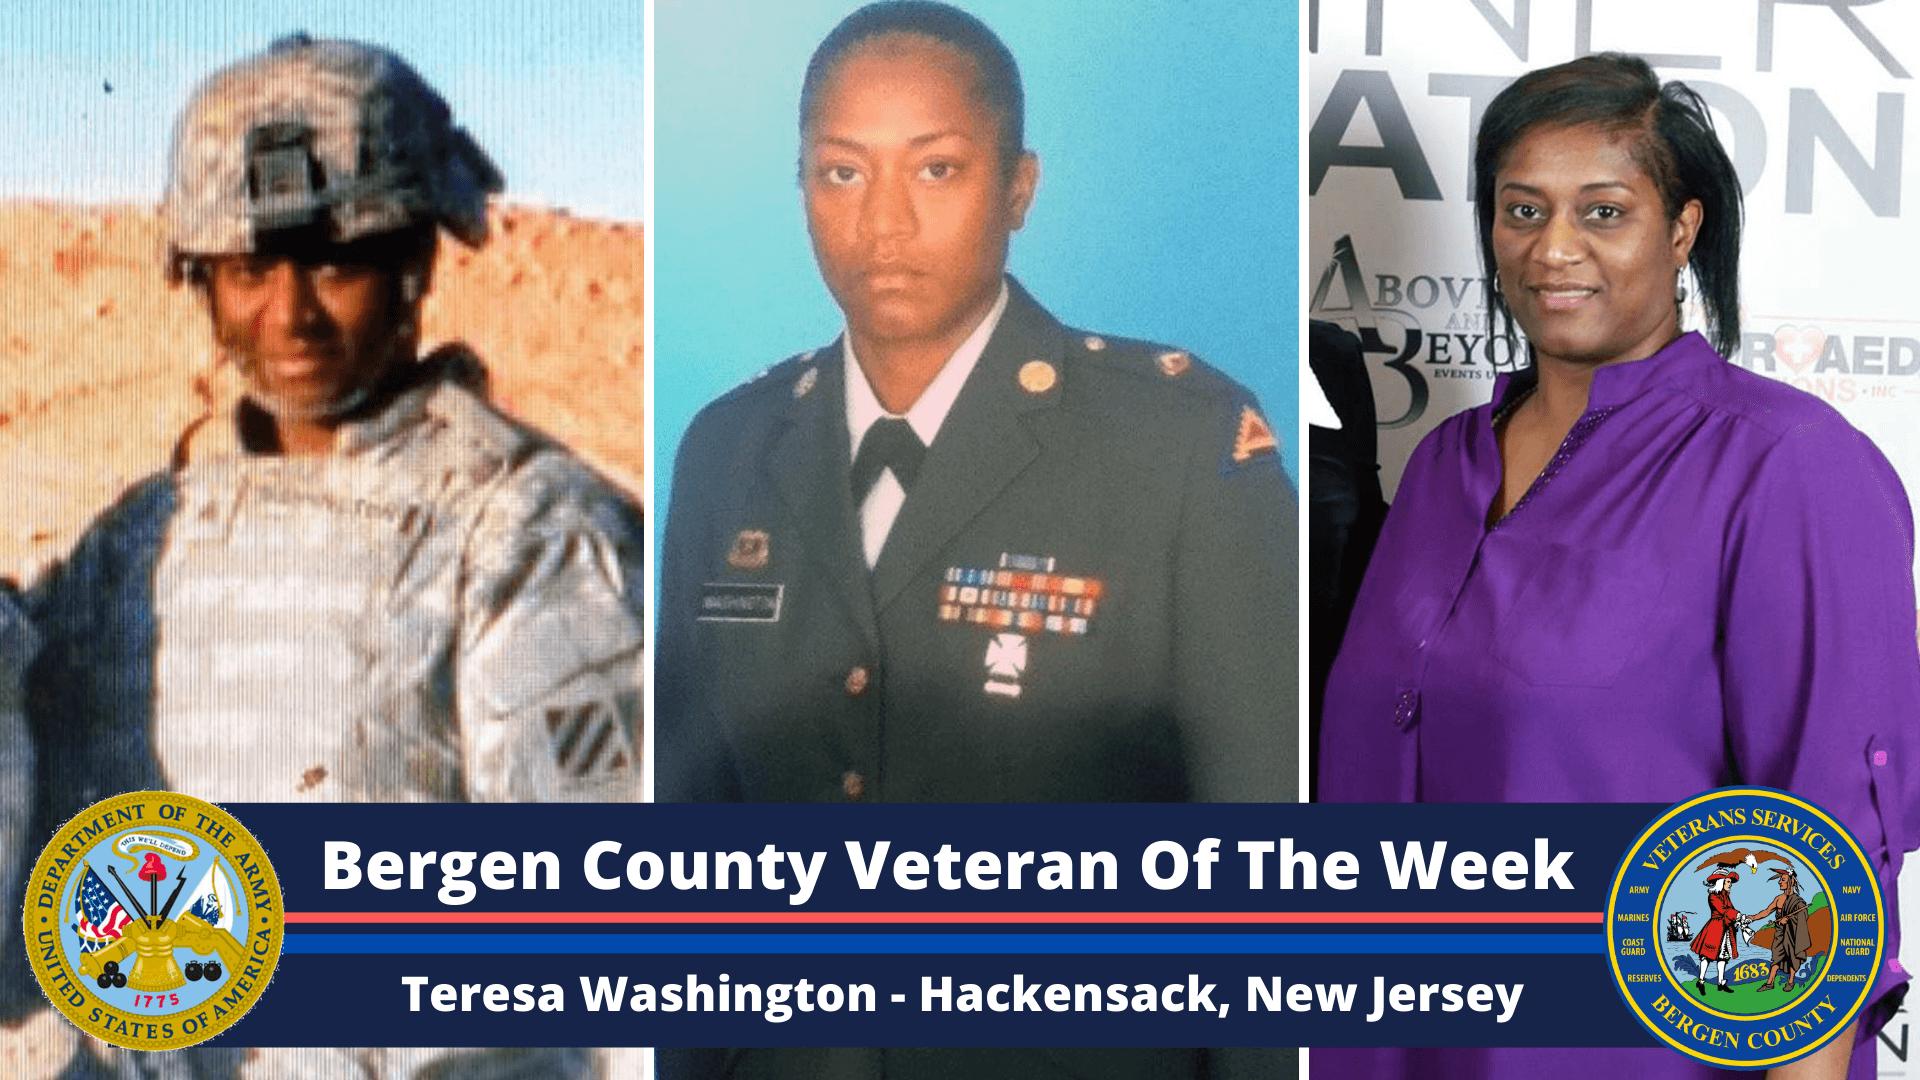 Bergen County Veteran of the Week: Teresa Washington